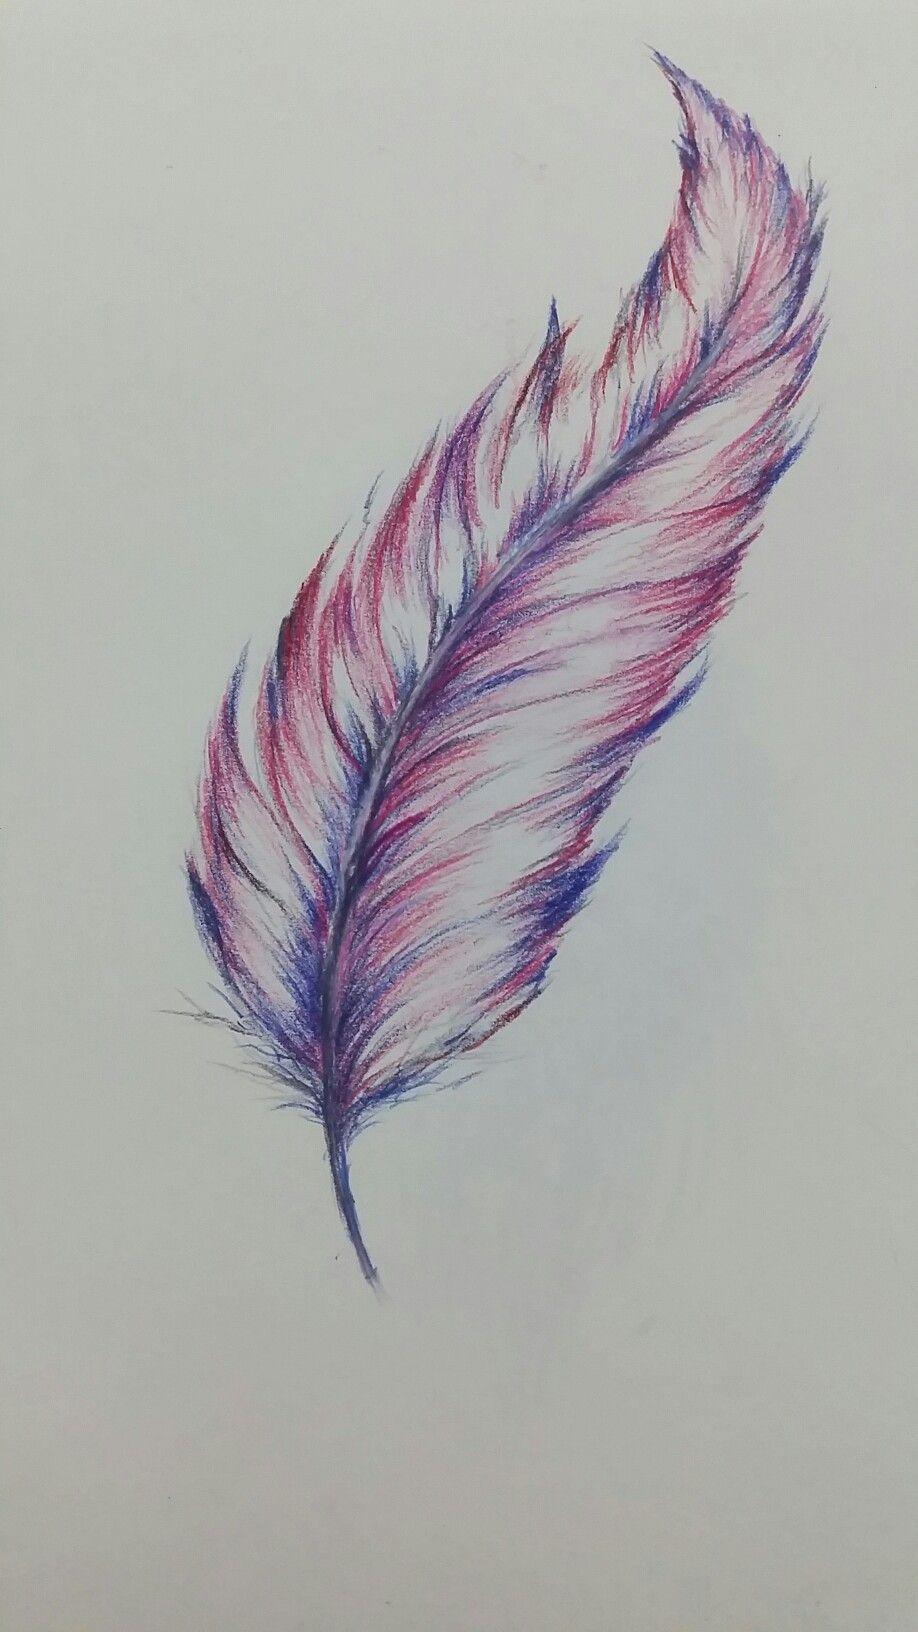 Illustrator Morgan Davidson Color Pencil Art Color Pencil